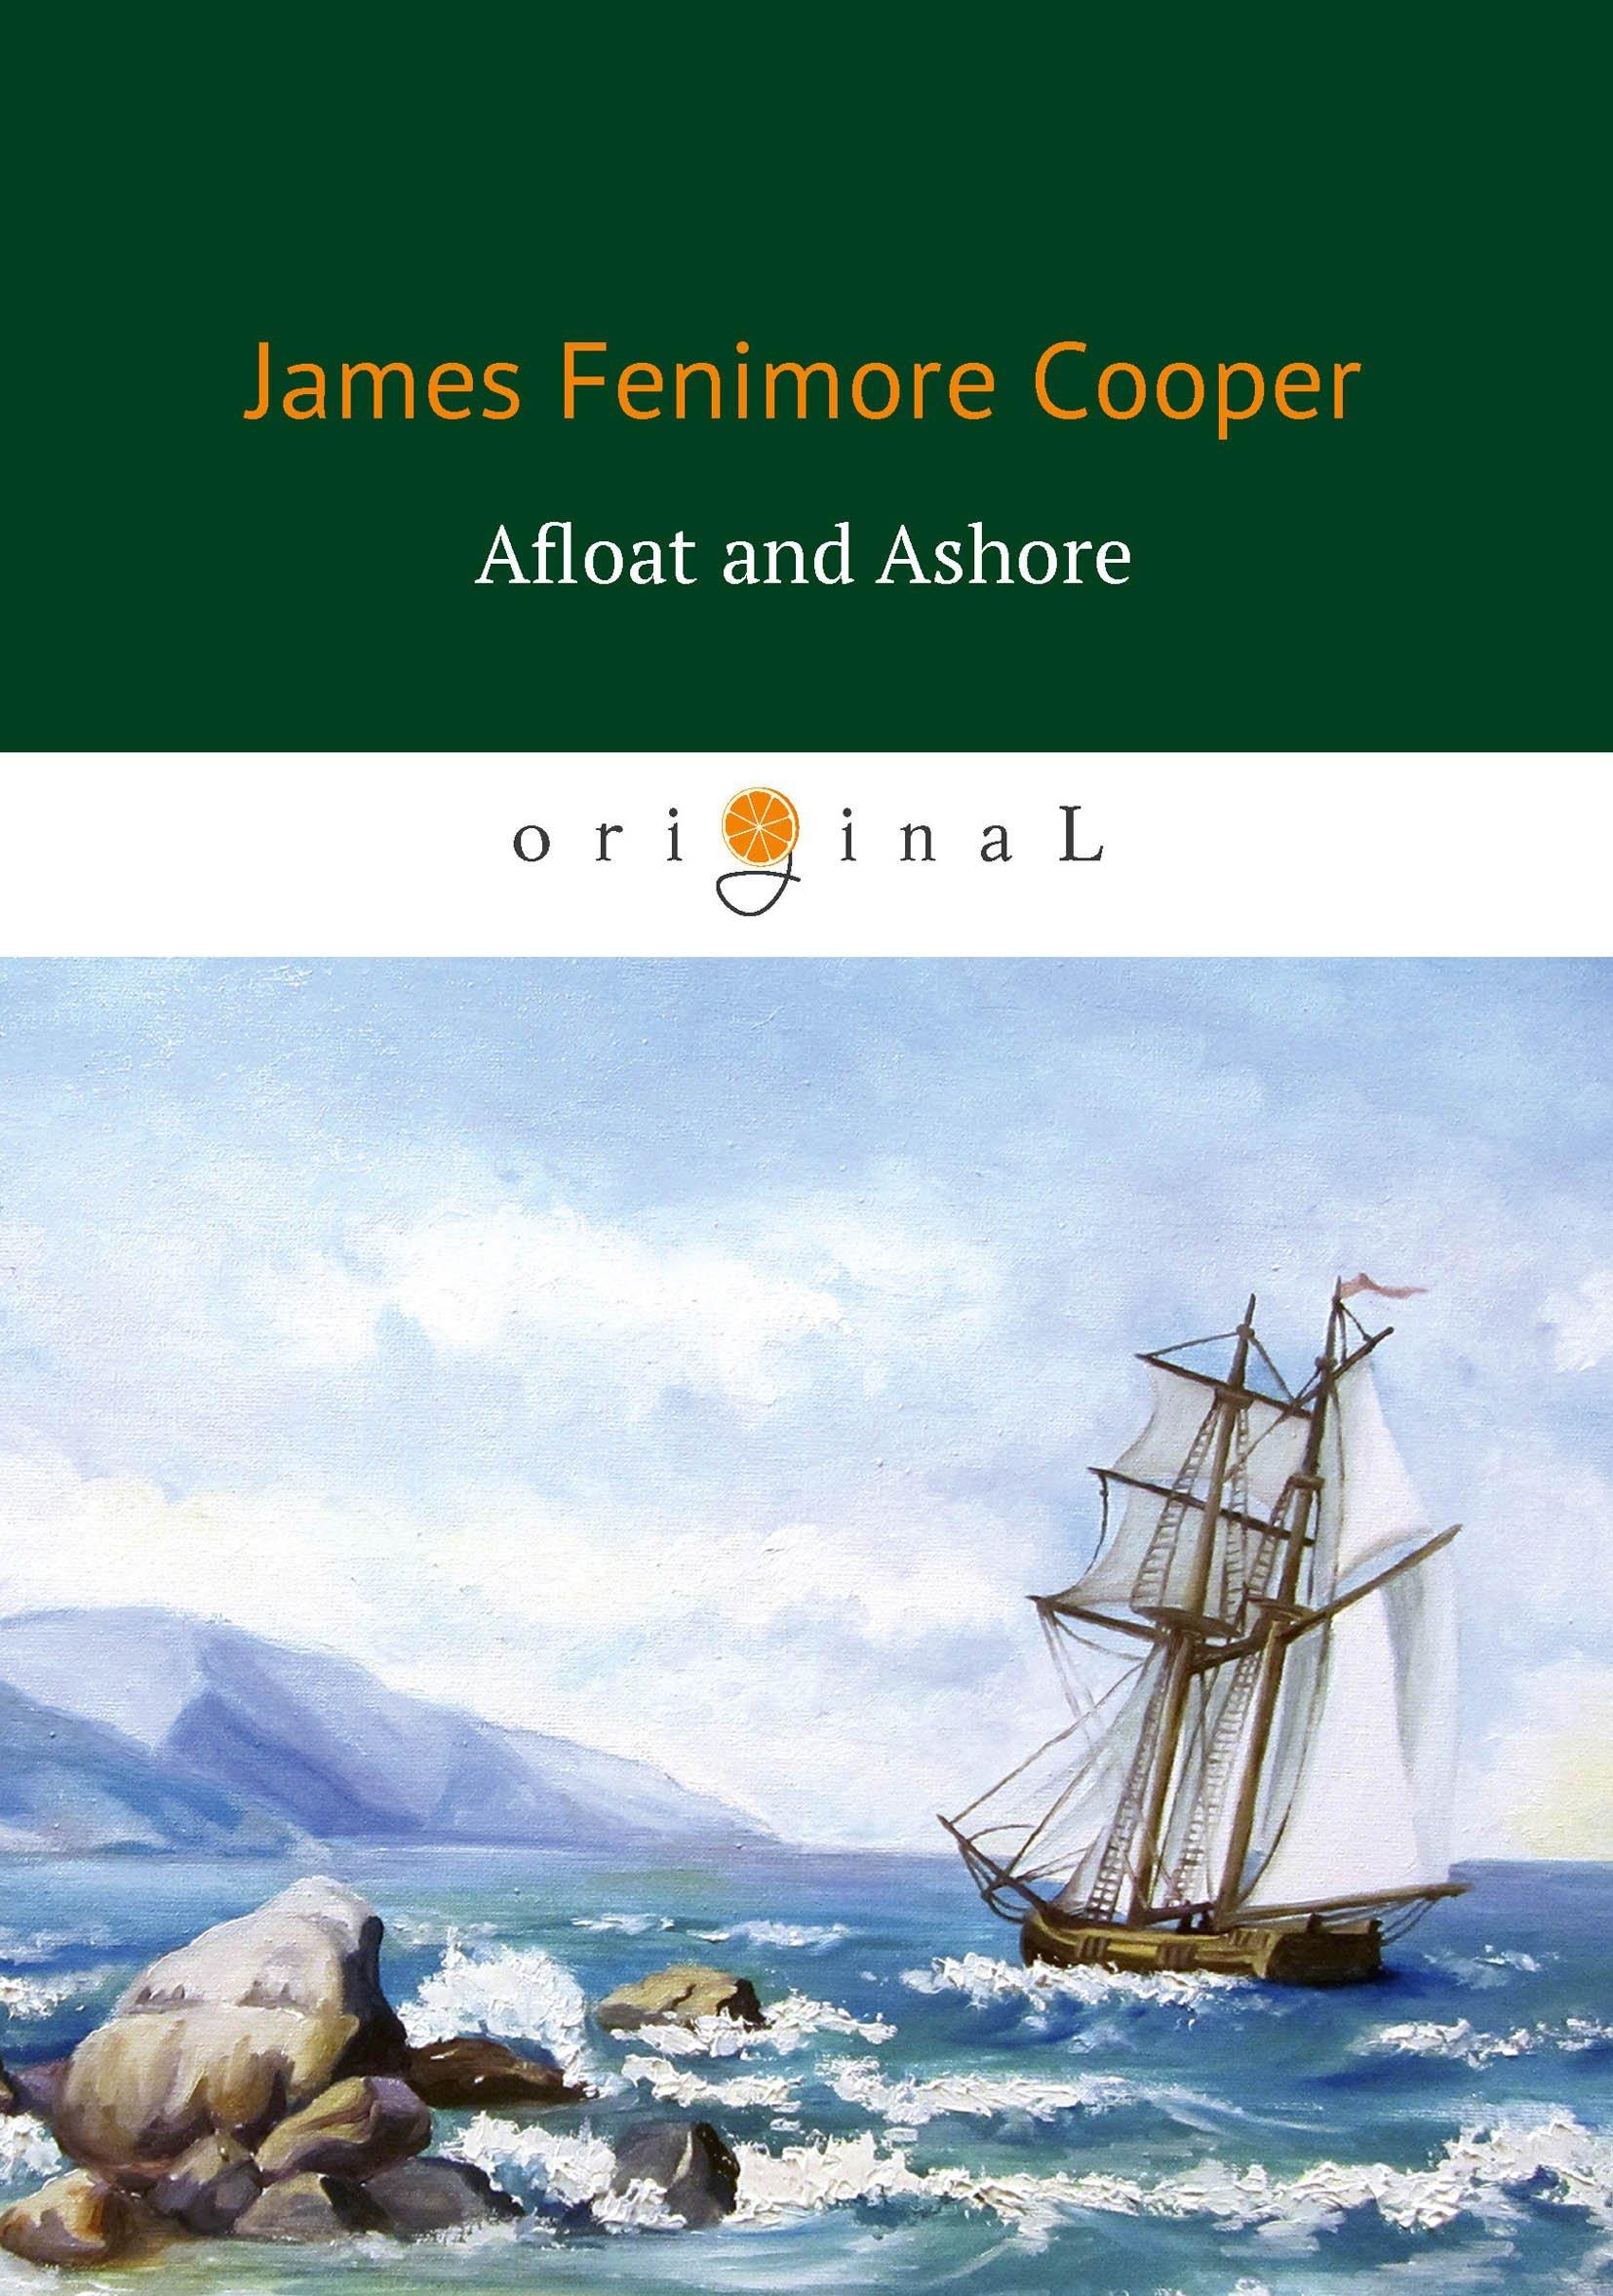 Купер Джеймс Фенимор Afloat and Ashore = На море и на суше: роман на англ.яз джеймс фенимор купер the red rover afloat and ashore